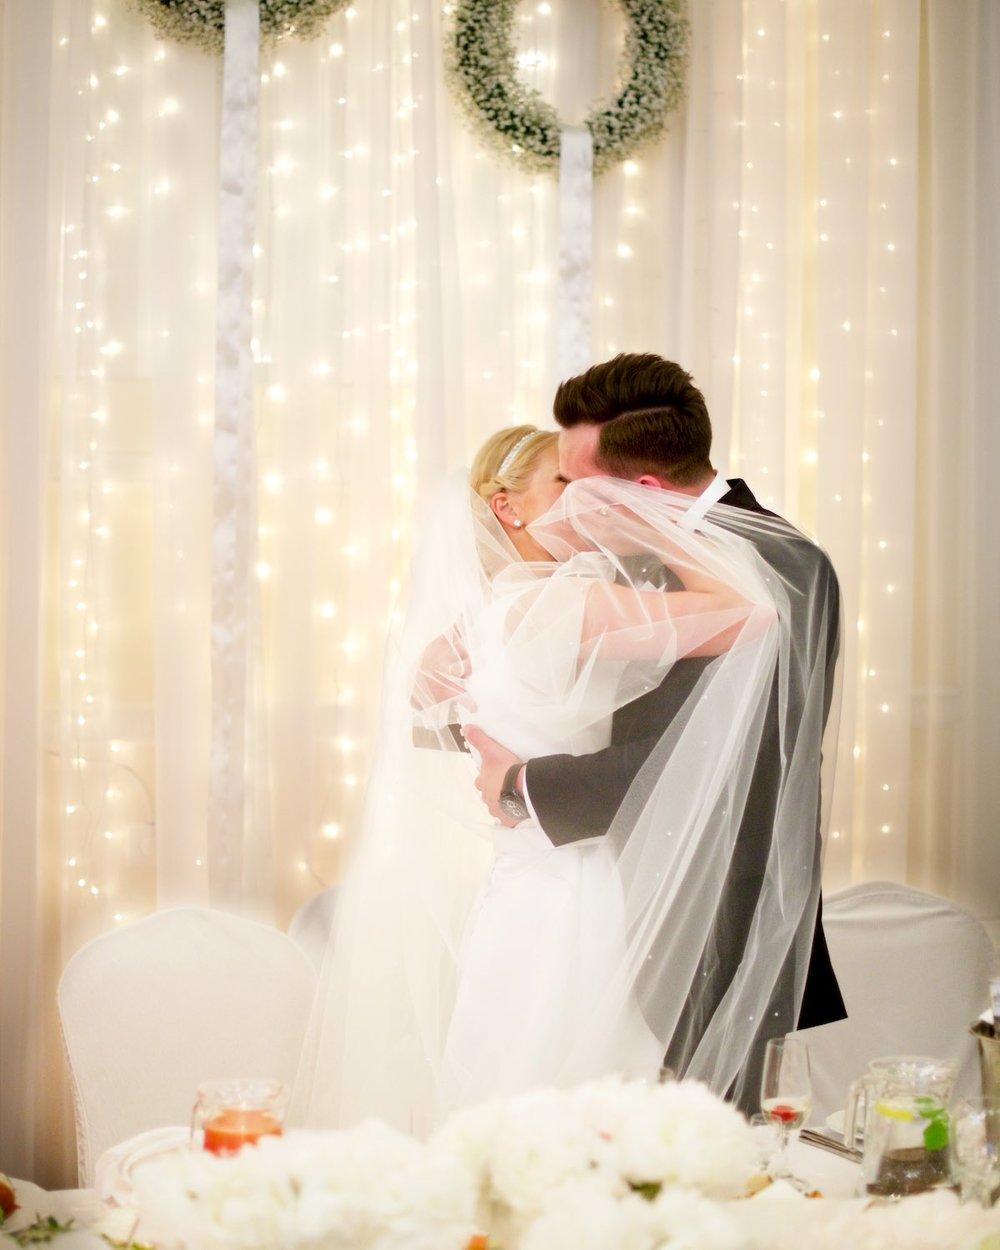 polish-wedding-michal-pfeil-26.jpg